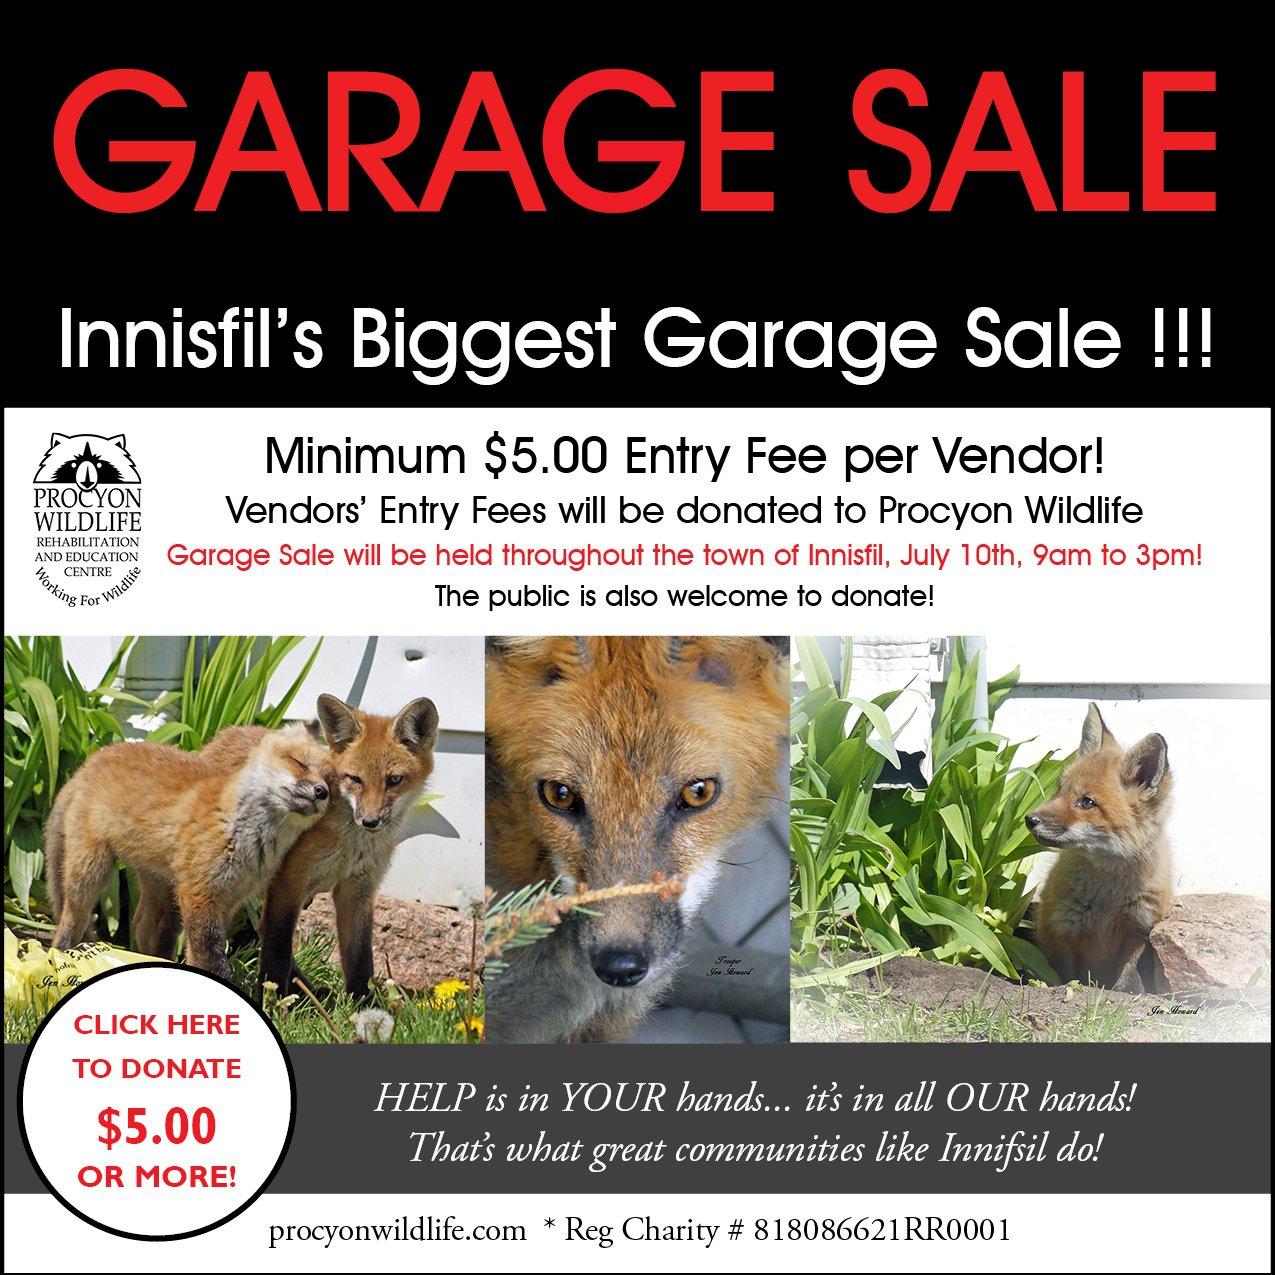 Innisfil's Biggest Garage Sale !!!